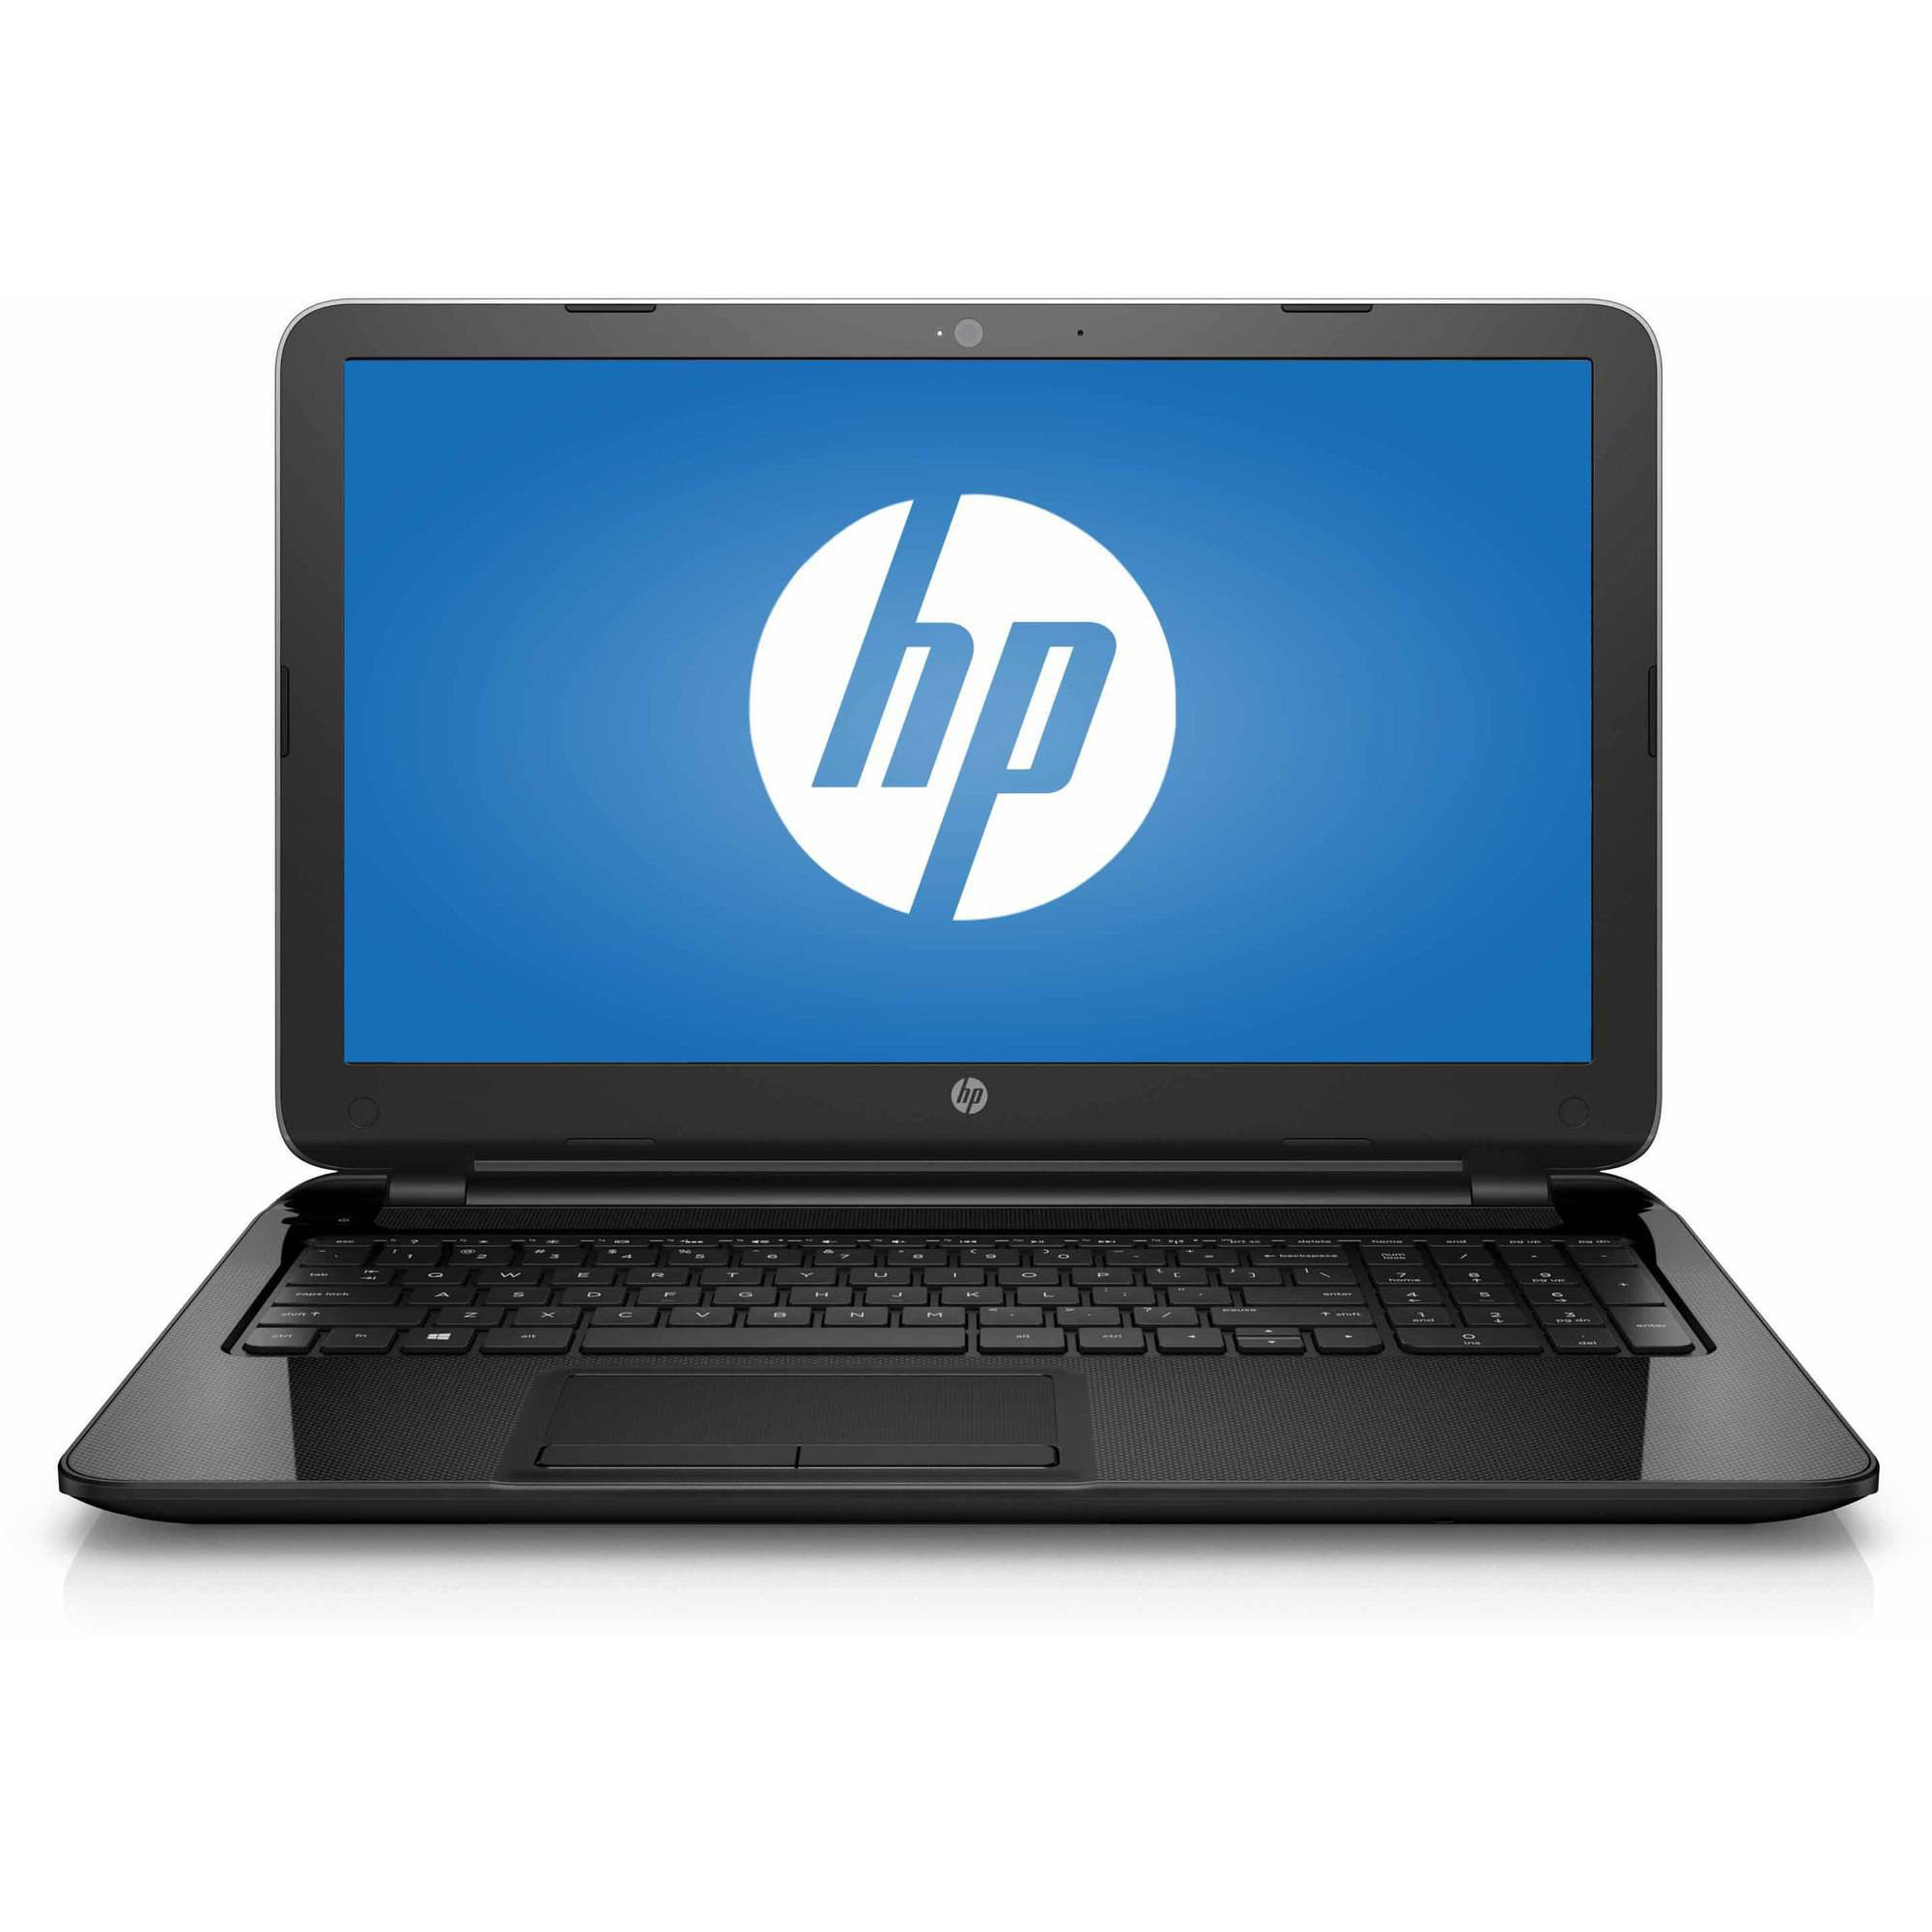 "Refurbished HP Black 15.6"" 15-f233wm Laptop PC with Intel Celeron N3050 Processor, 4GB Memory, 500GB Hard Drive and Windows 10 Home"